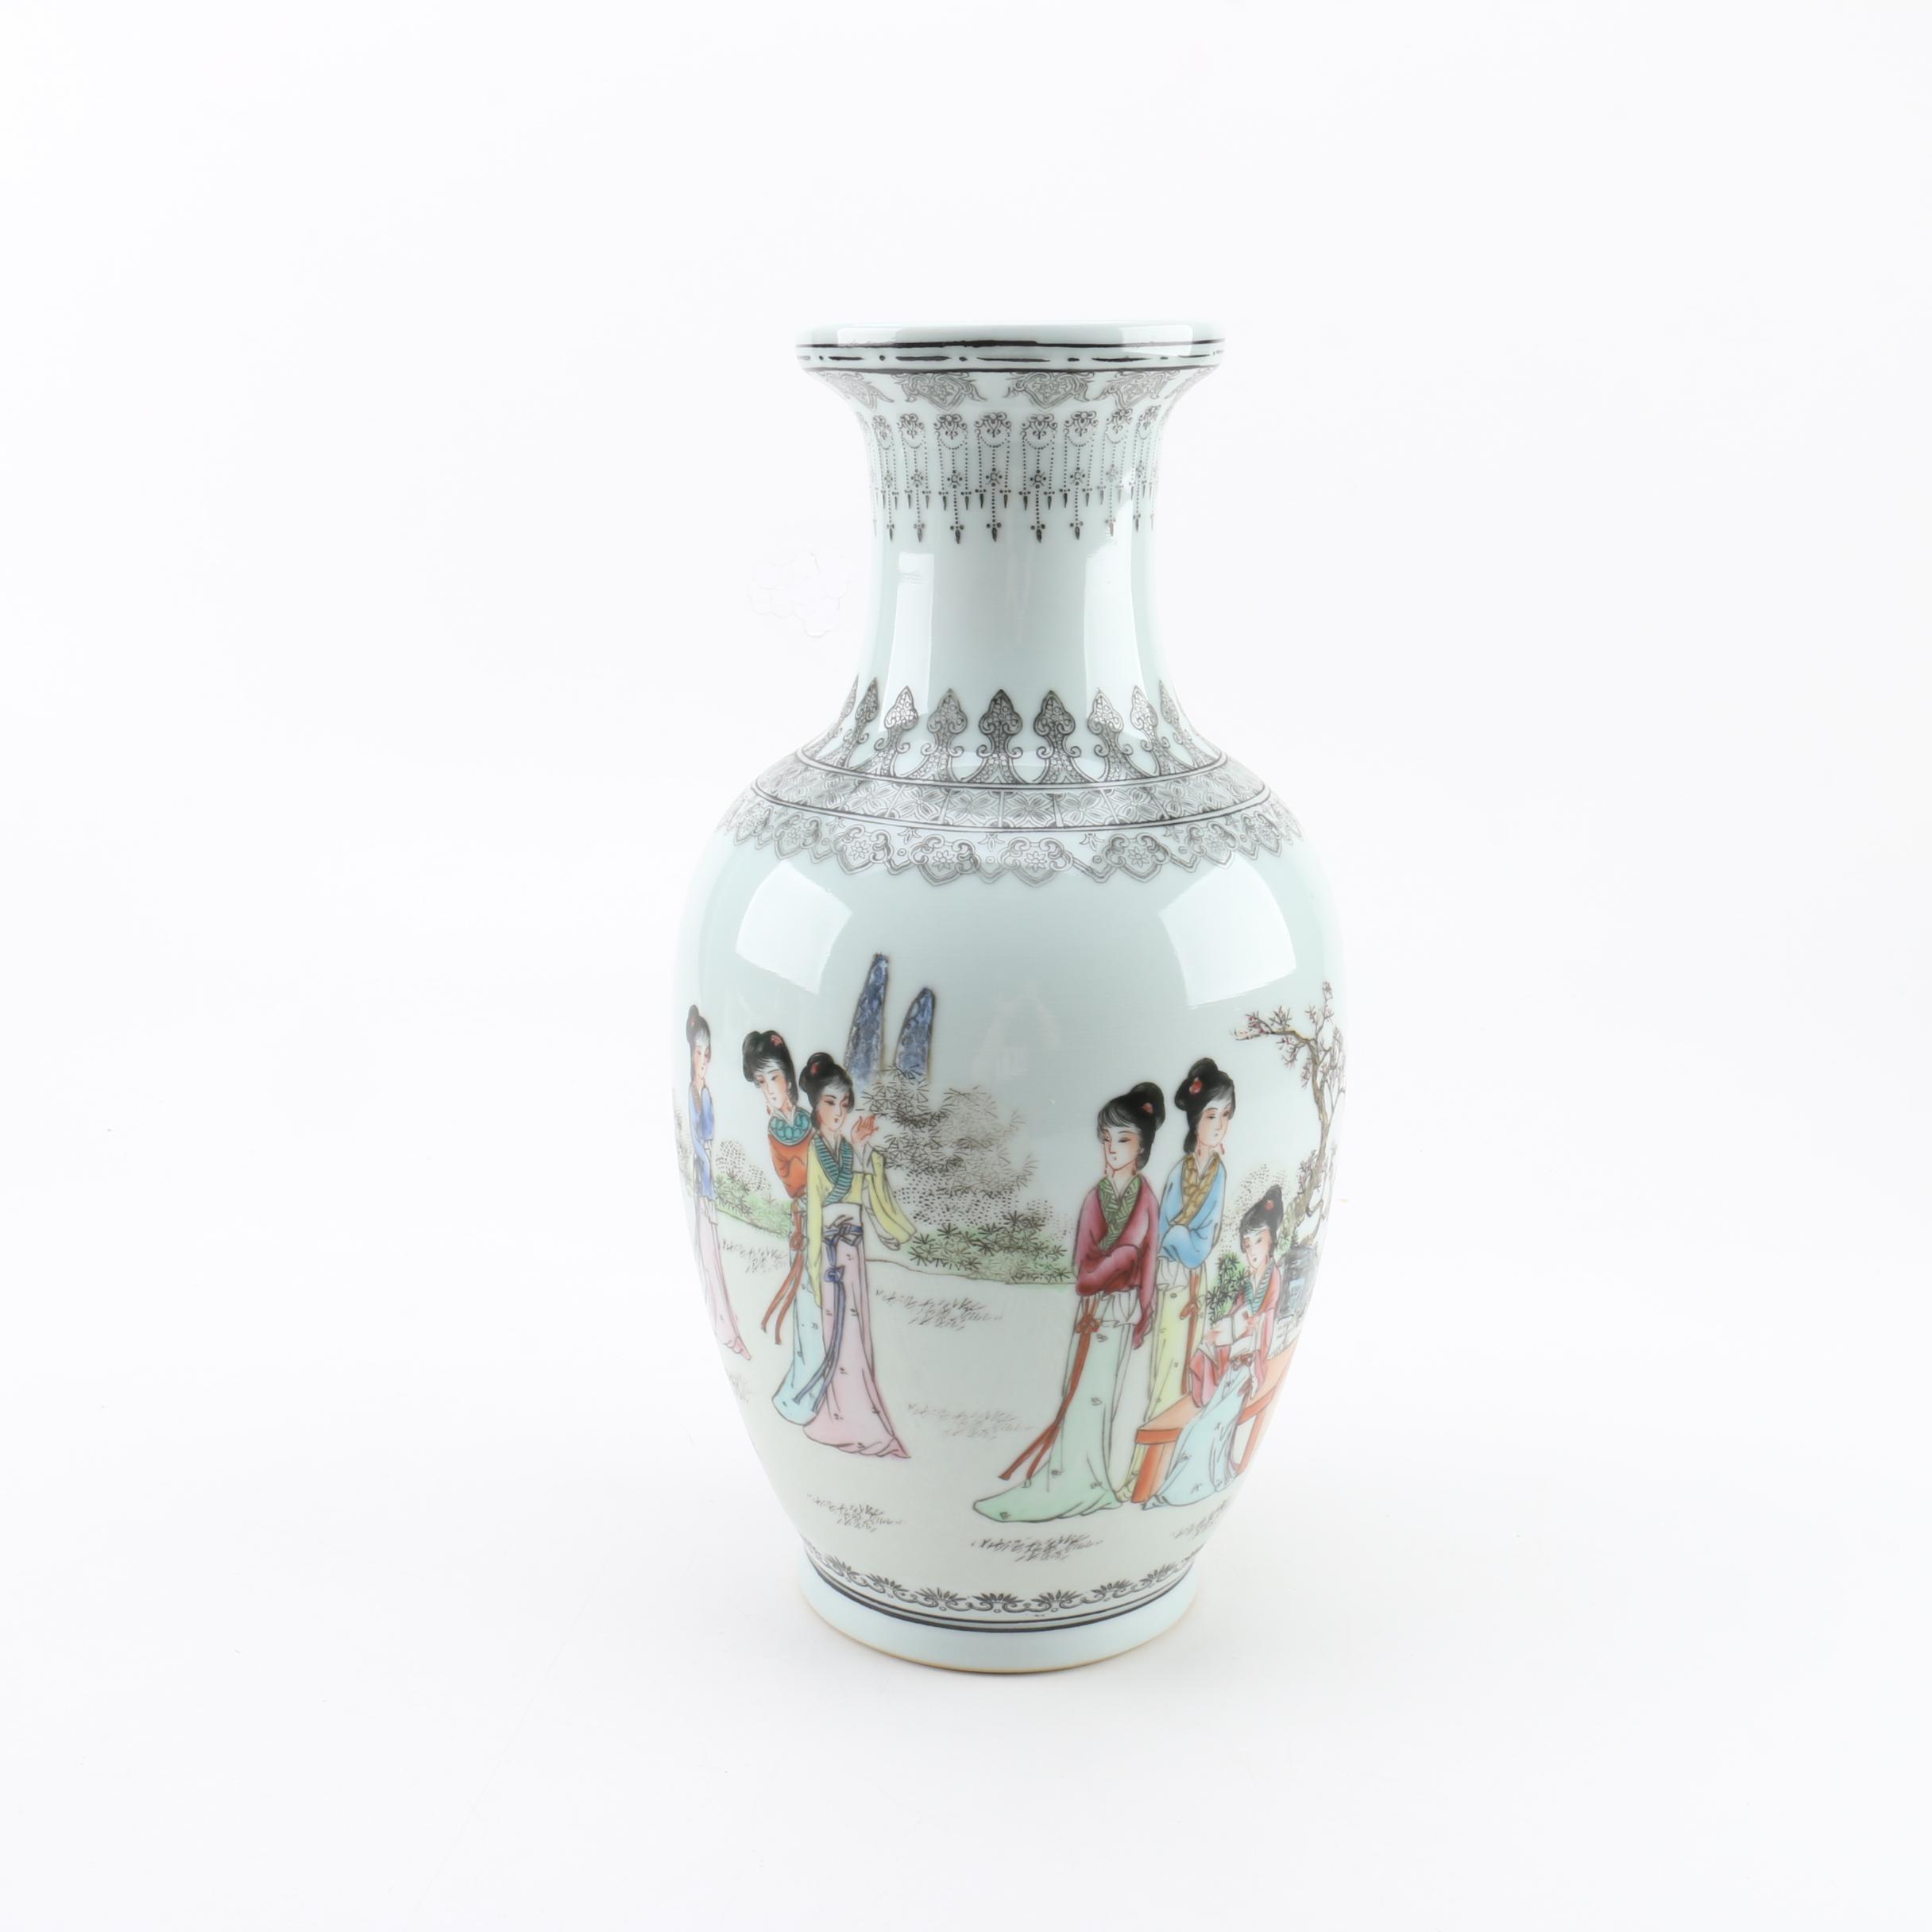 Chinese Jiangxi Hand-Painted Porcelain Vase